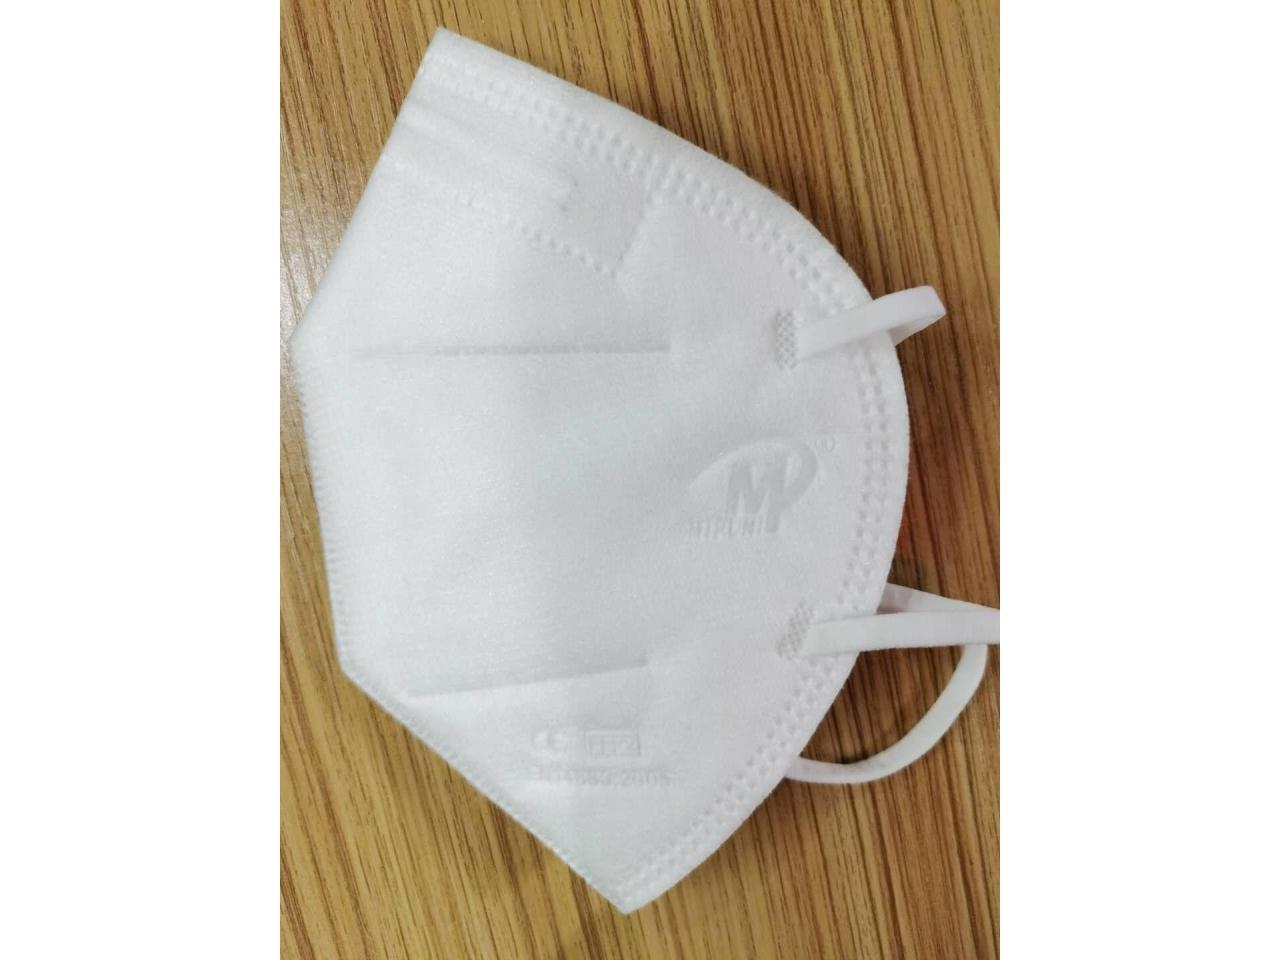 Медицинская маска 5-слойная KN95 EN14683 FDA - 2